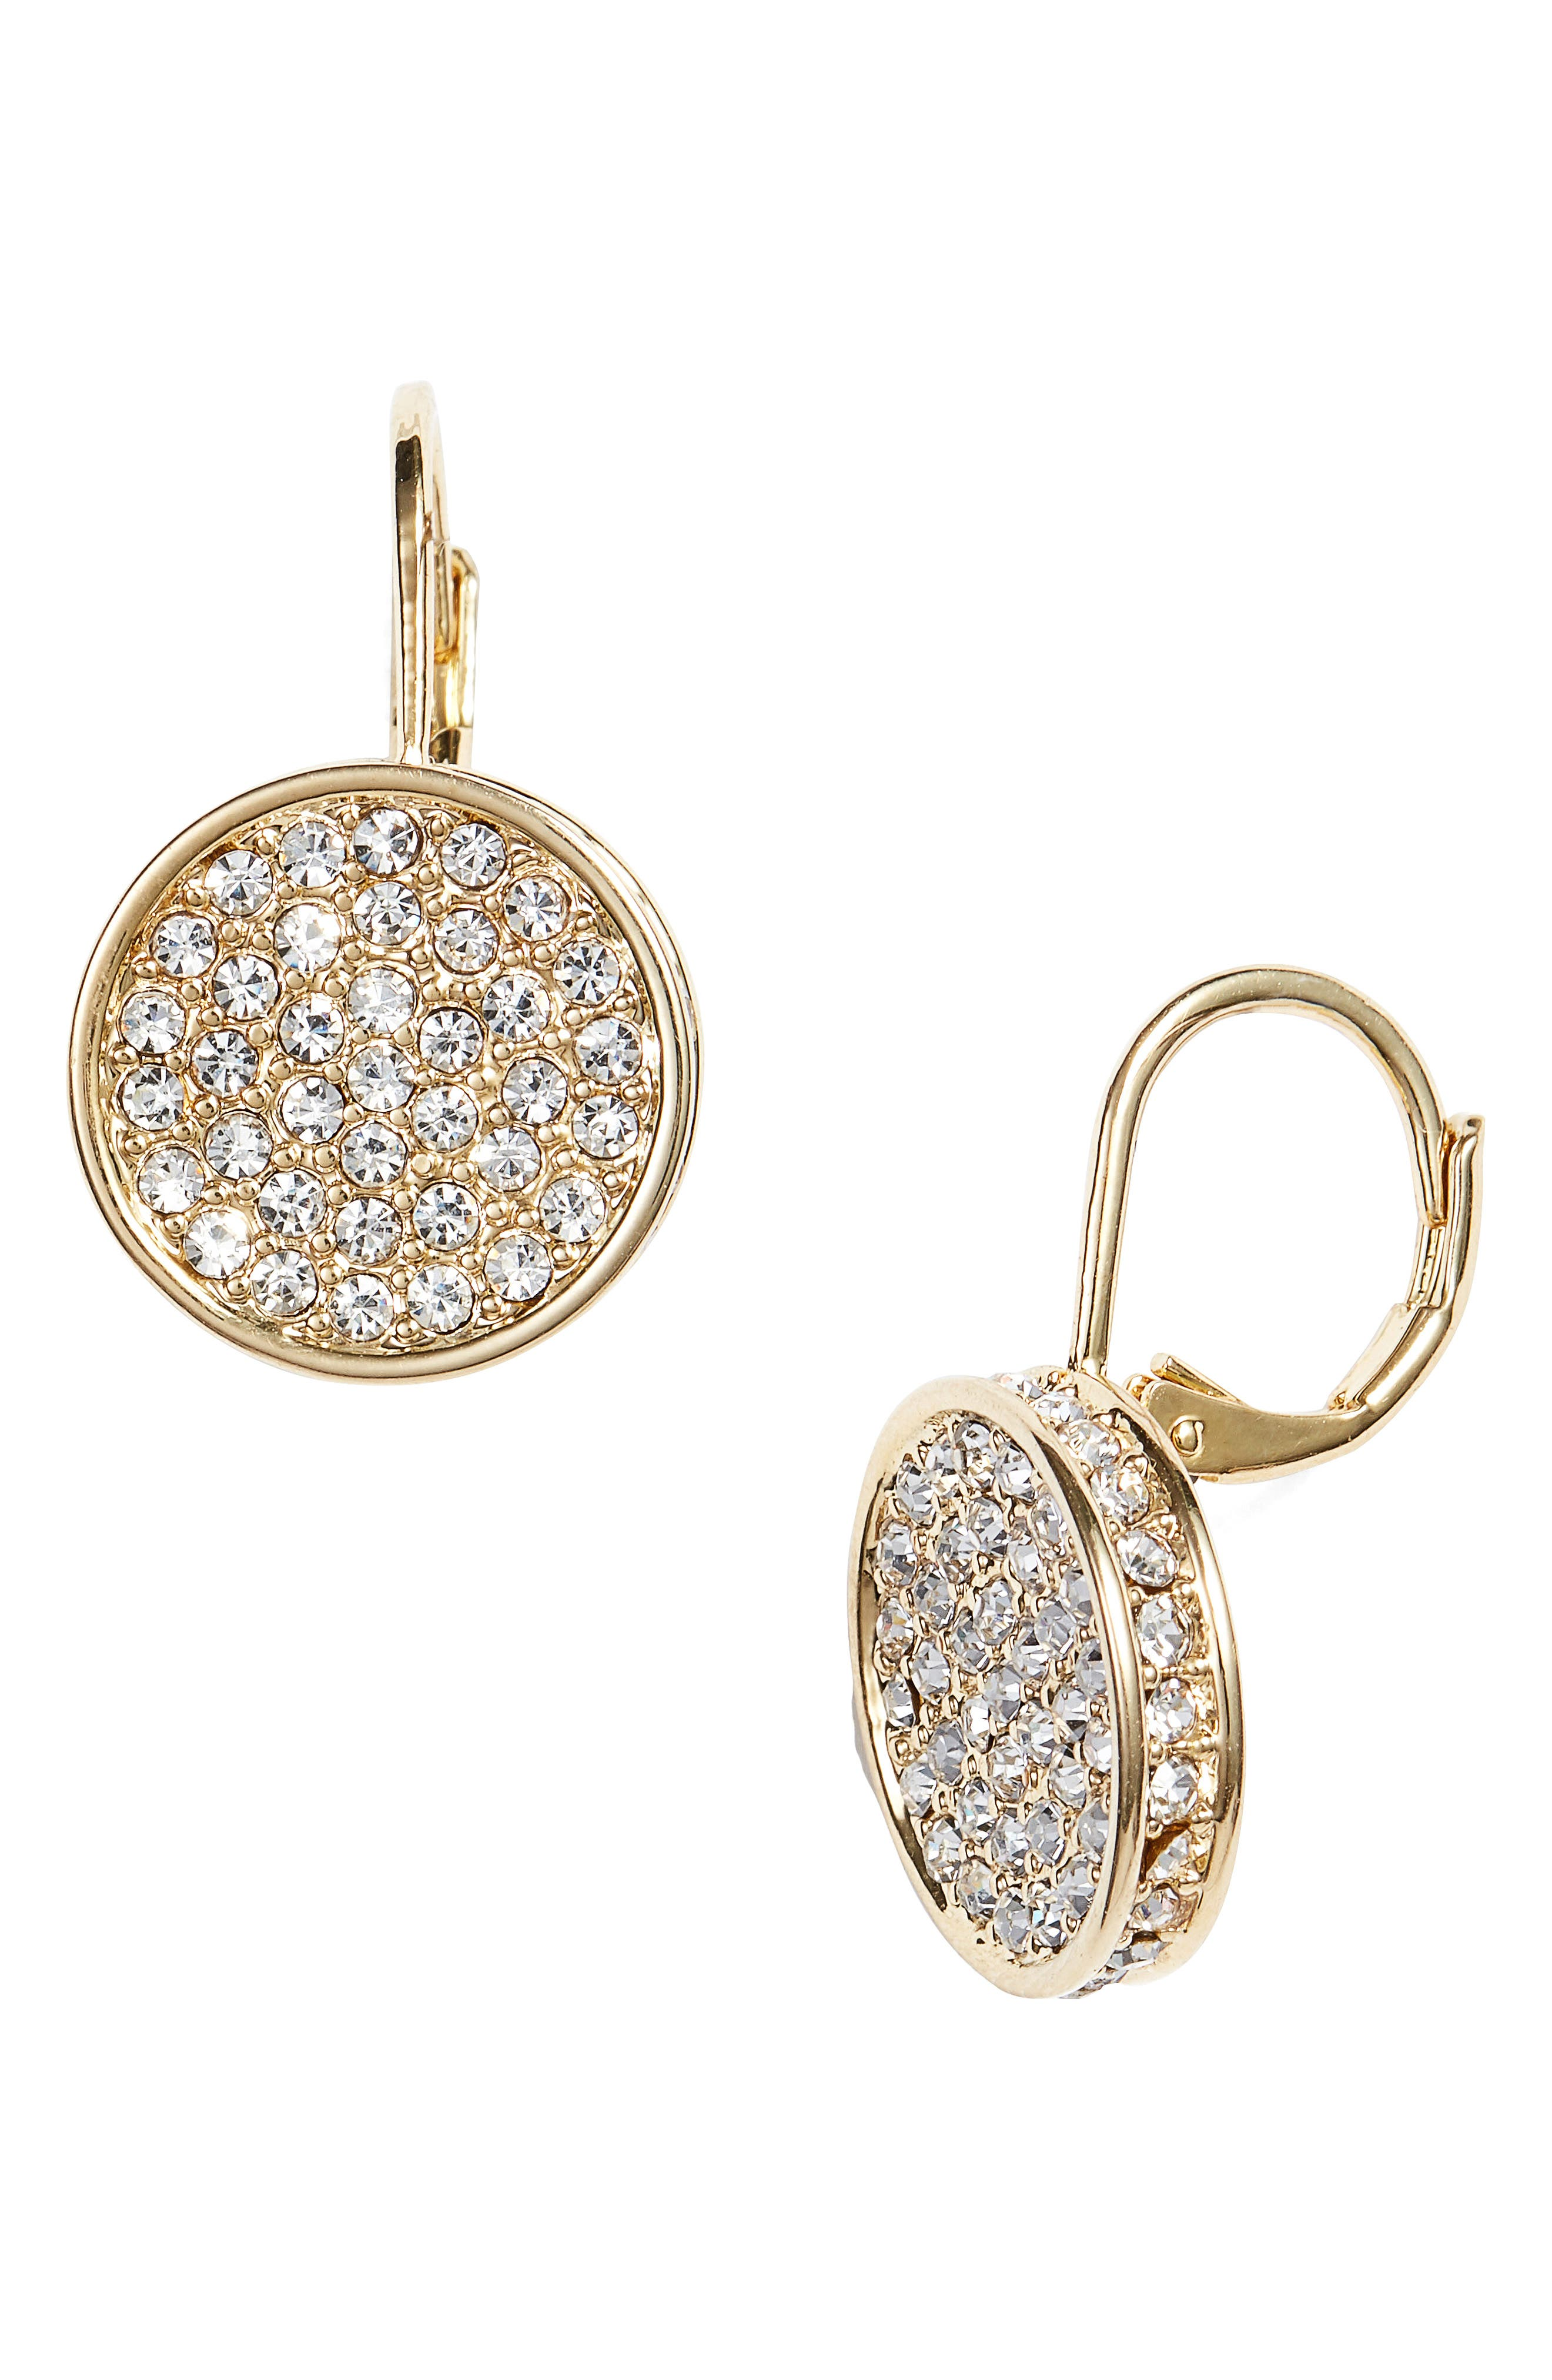 Alternate Image 1 Selected - Vince Camuto Crystal Glitter Earrings